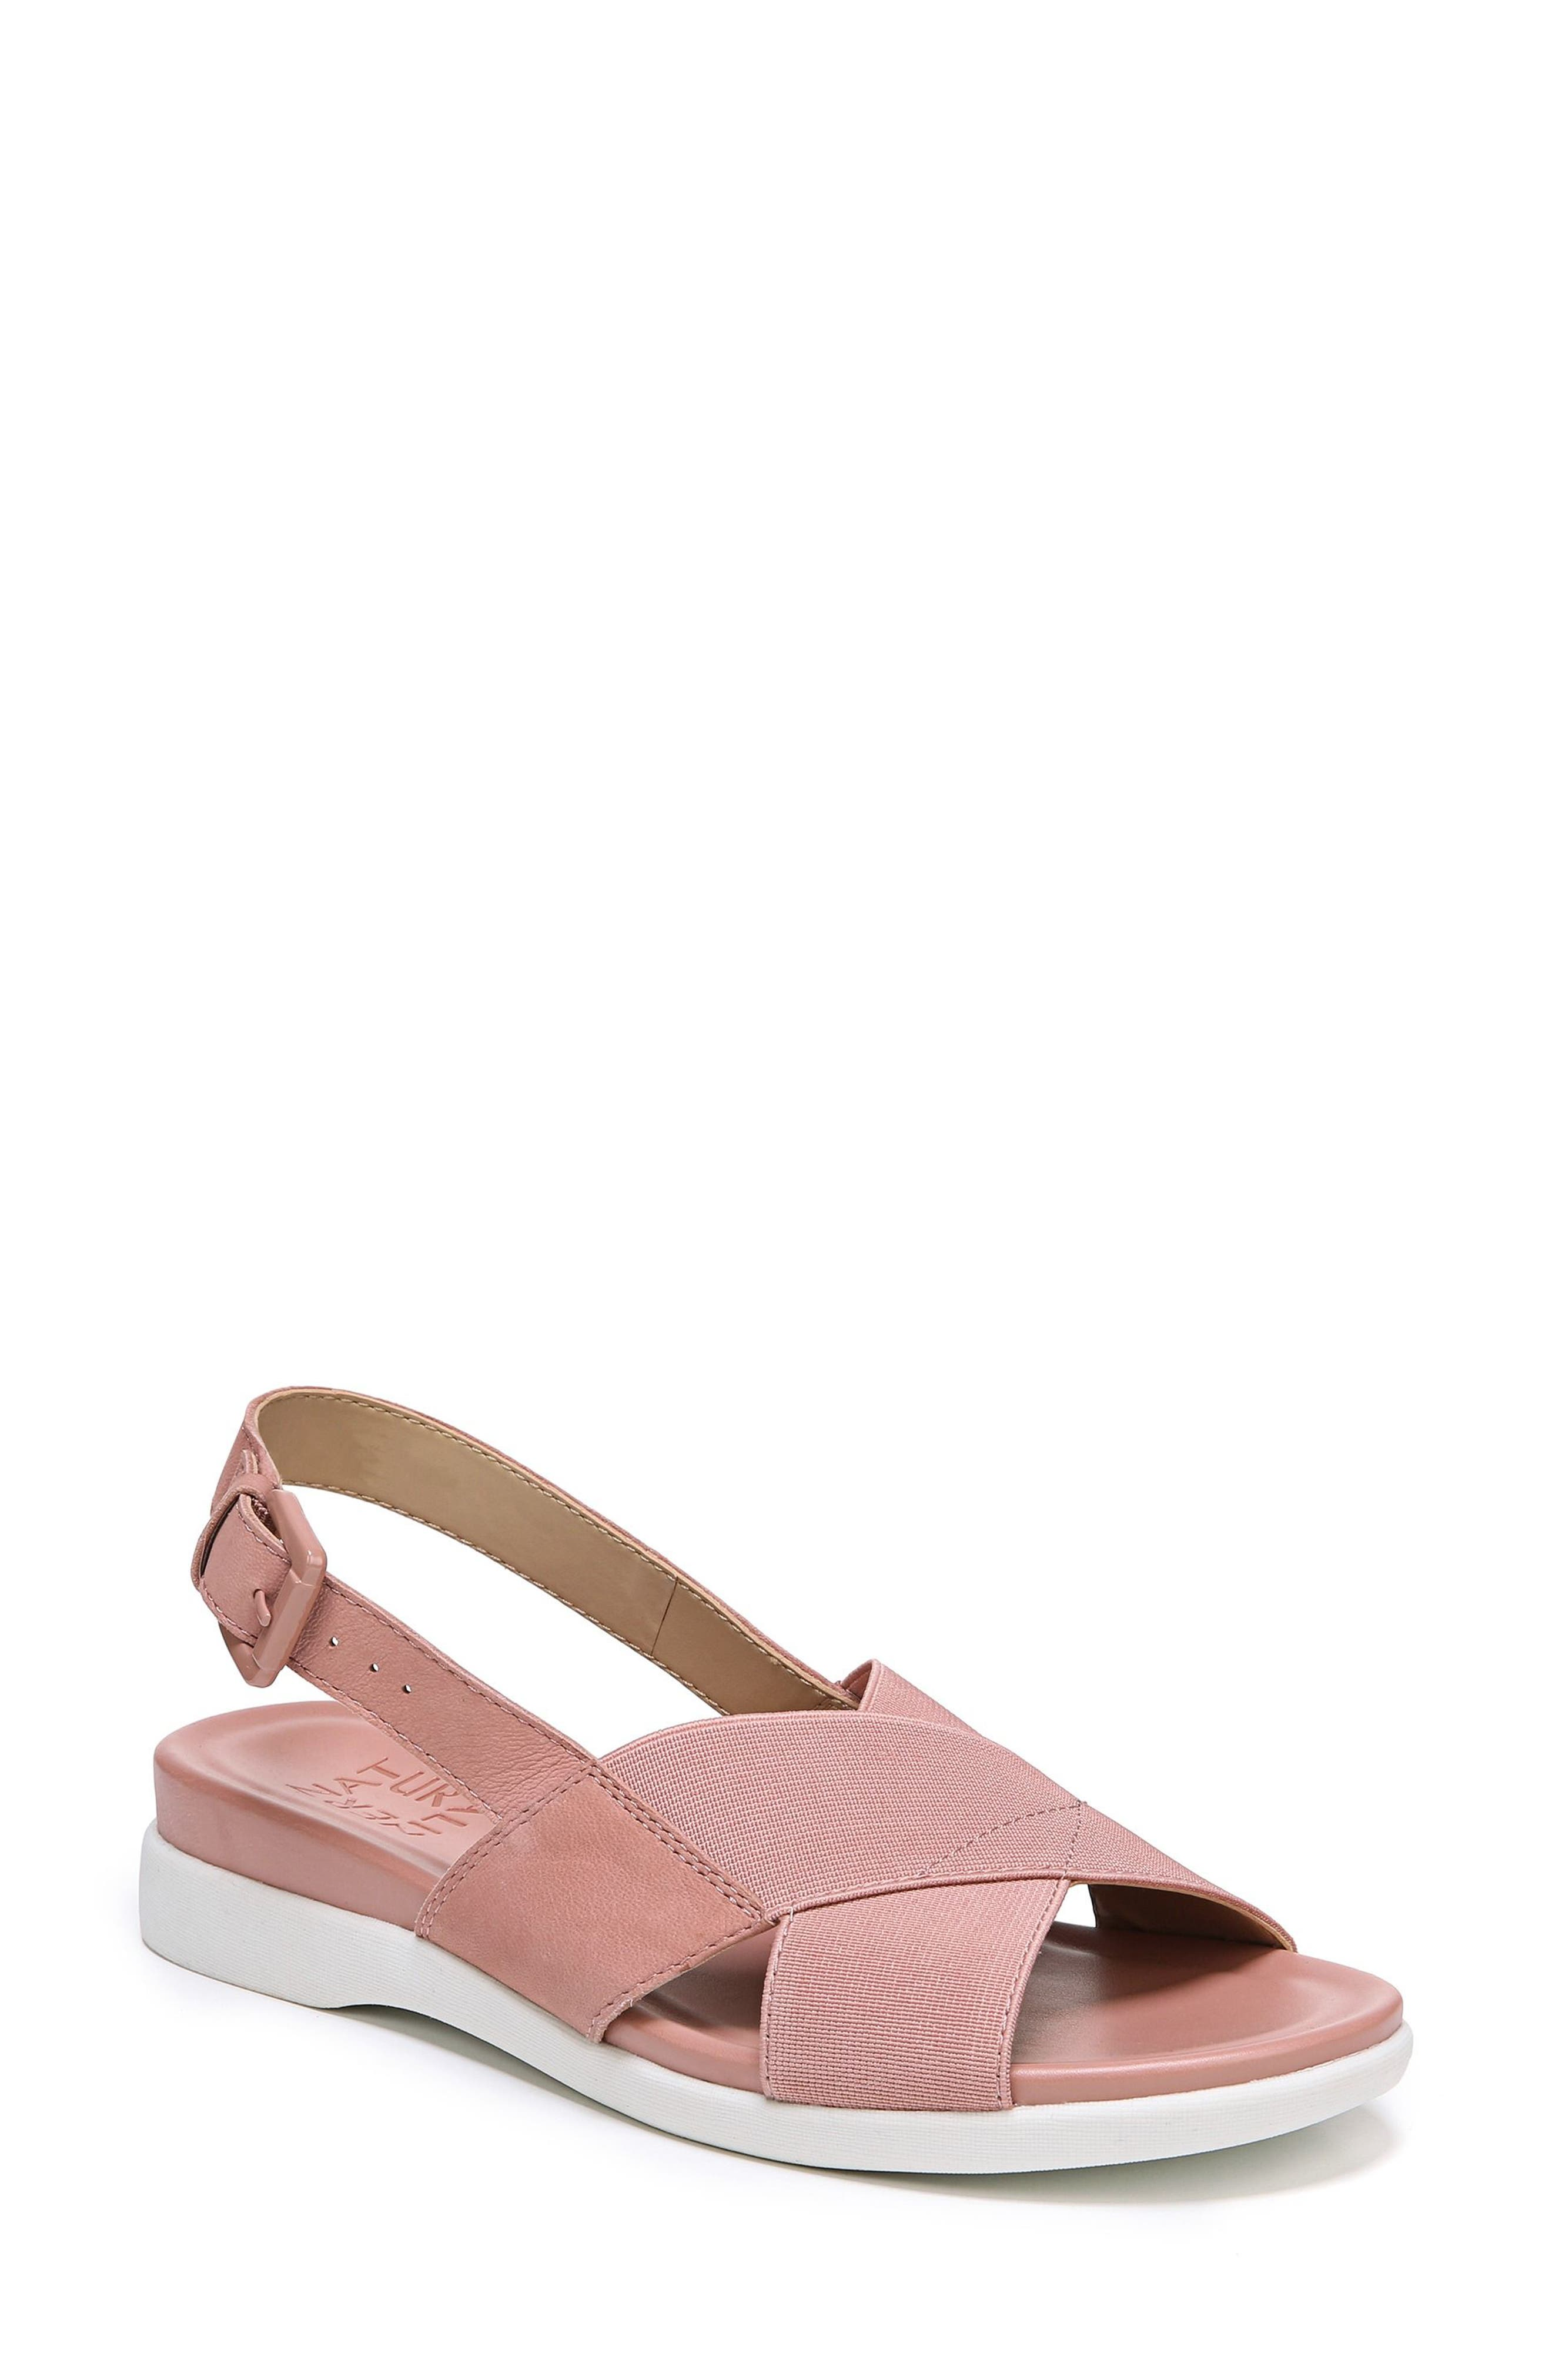 Eliza Wedge Sandal,                             Main thumbnail 1, color,                             Pink Nubuck Leather